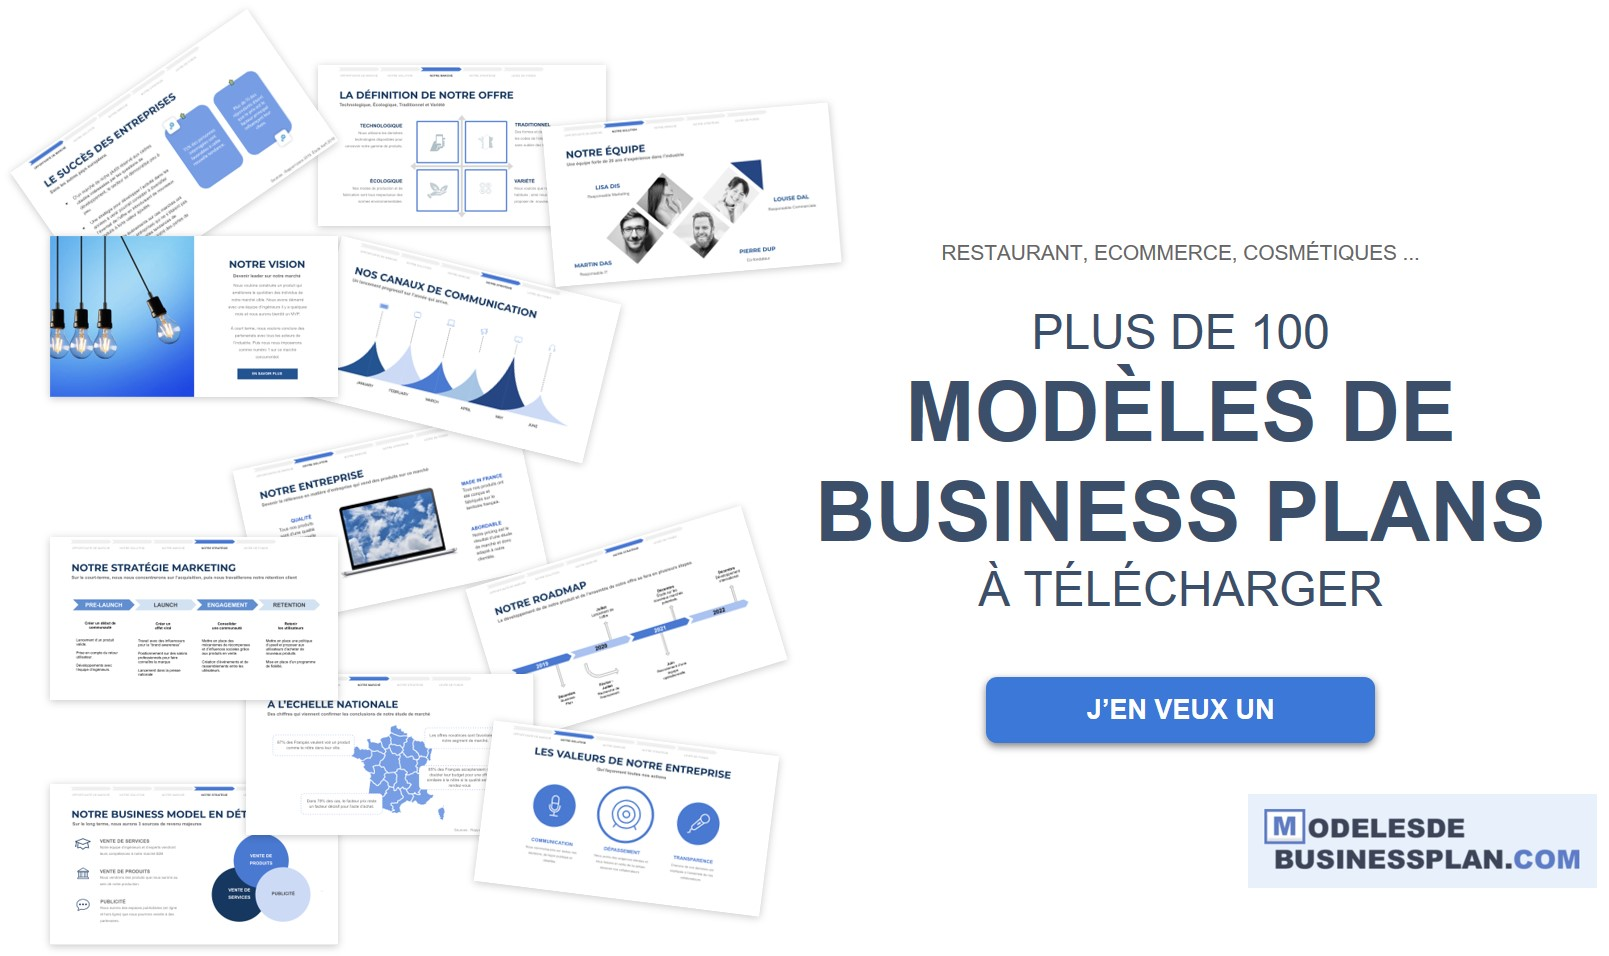 Business plan : 101 idées